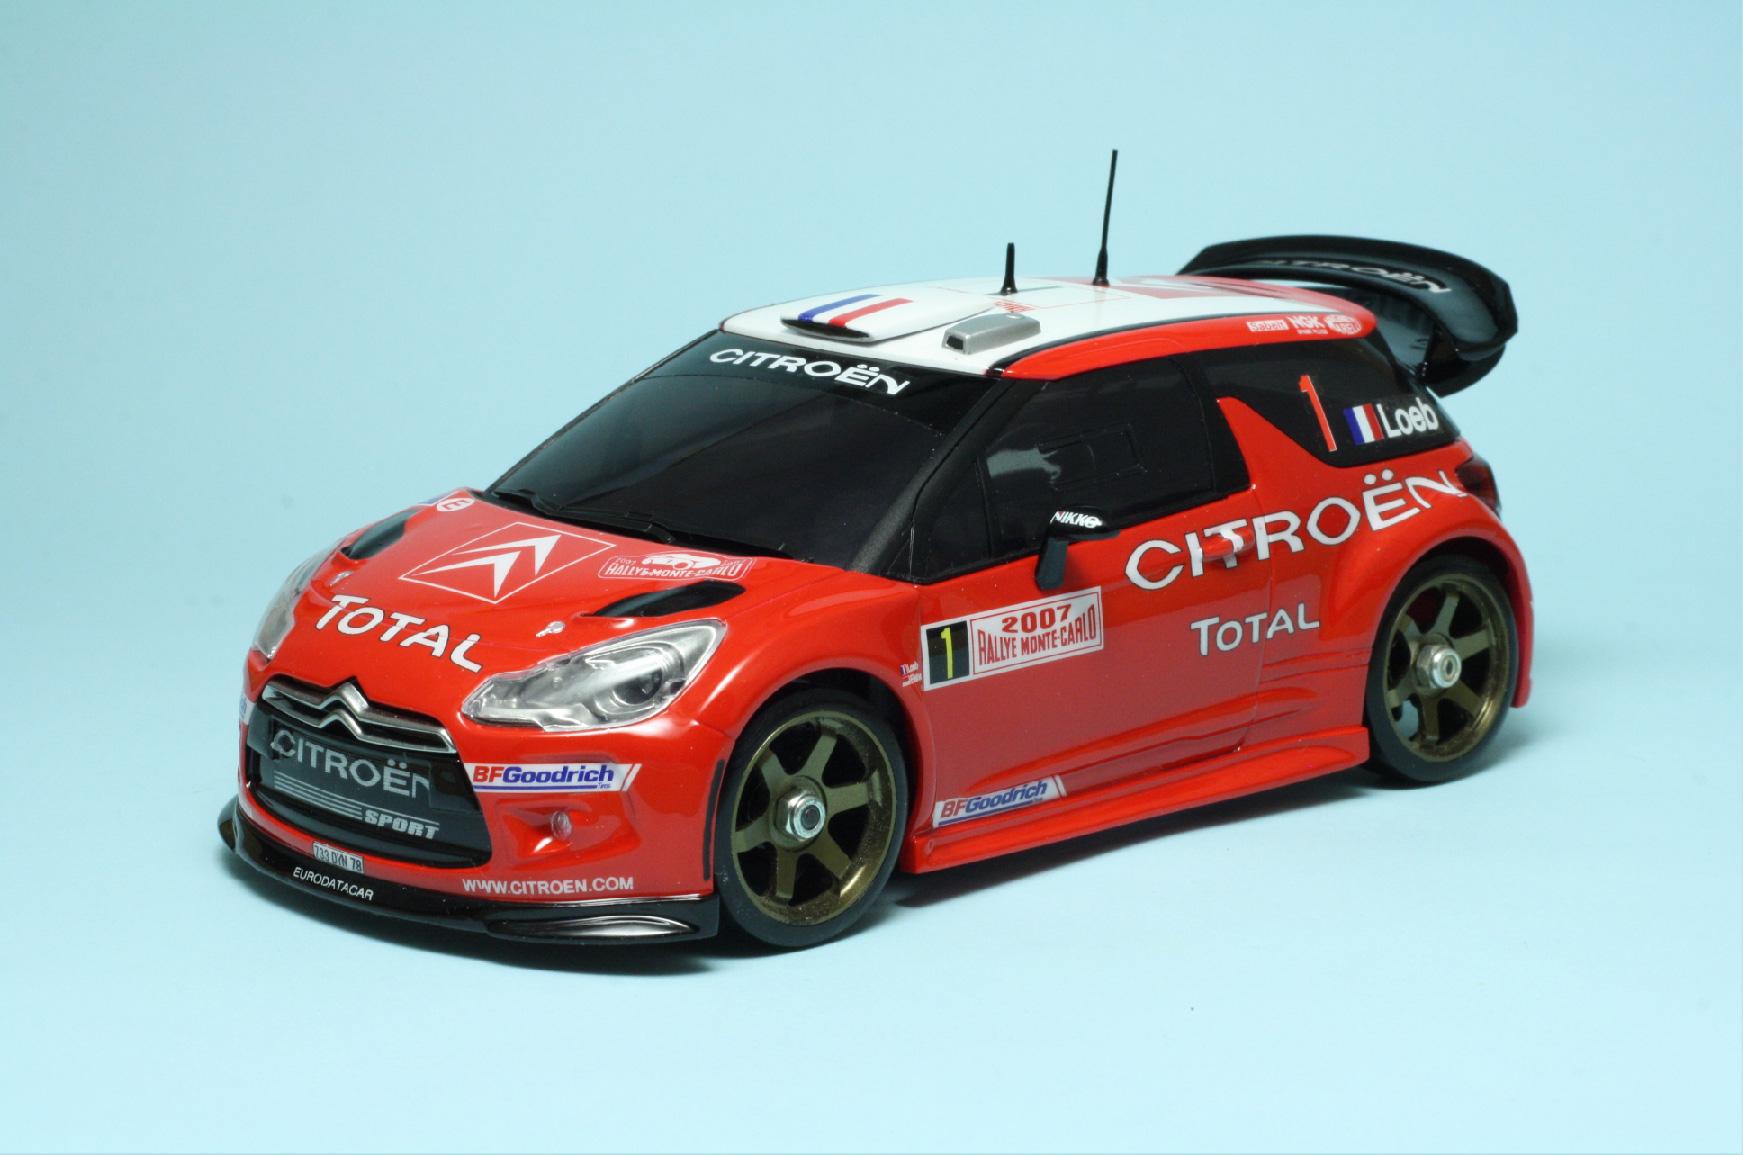 GHA002 Aero Parts Set Ver.1 for Citroen DS3 WRC 2011 - GARAGE HIRO ...